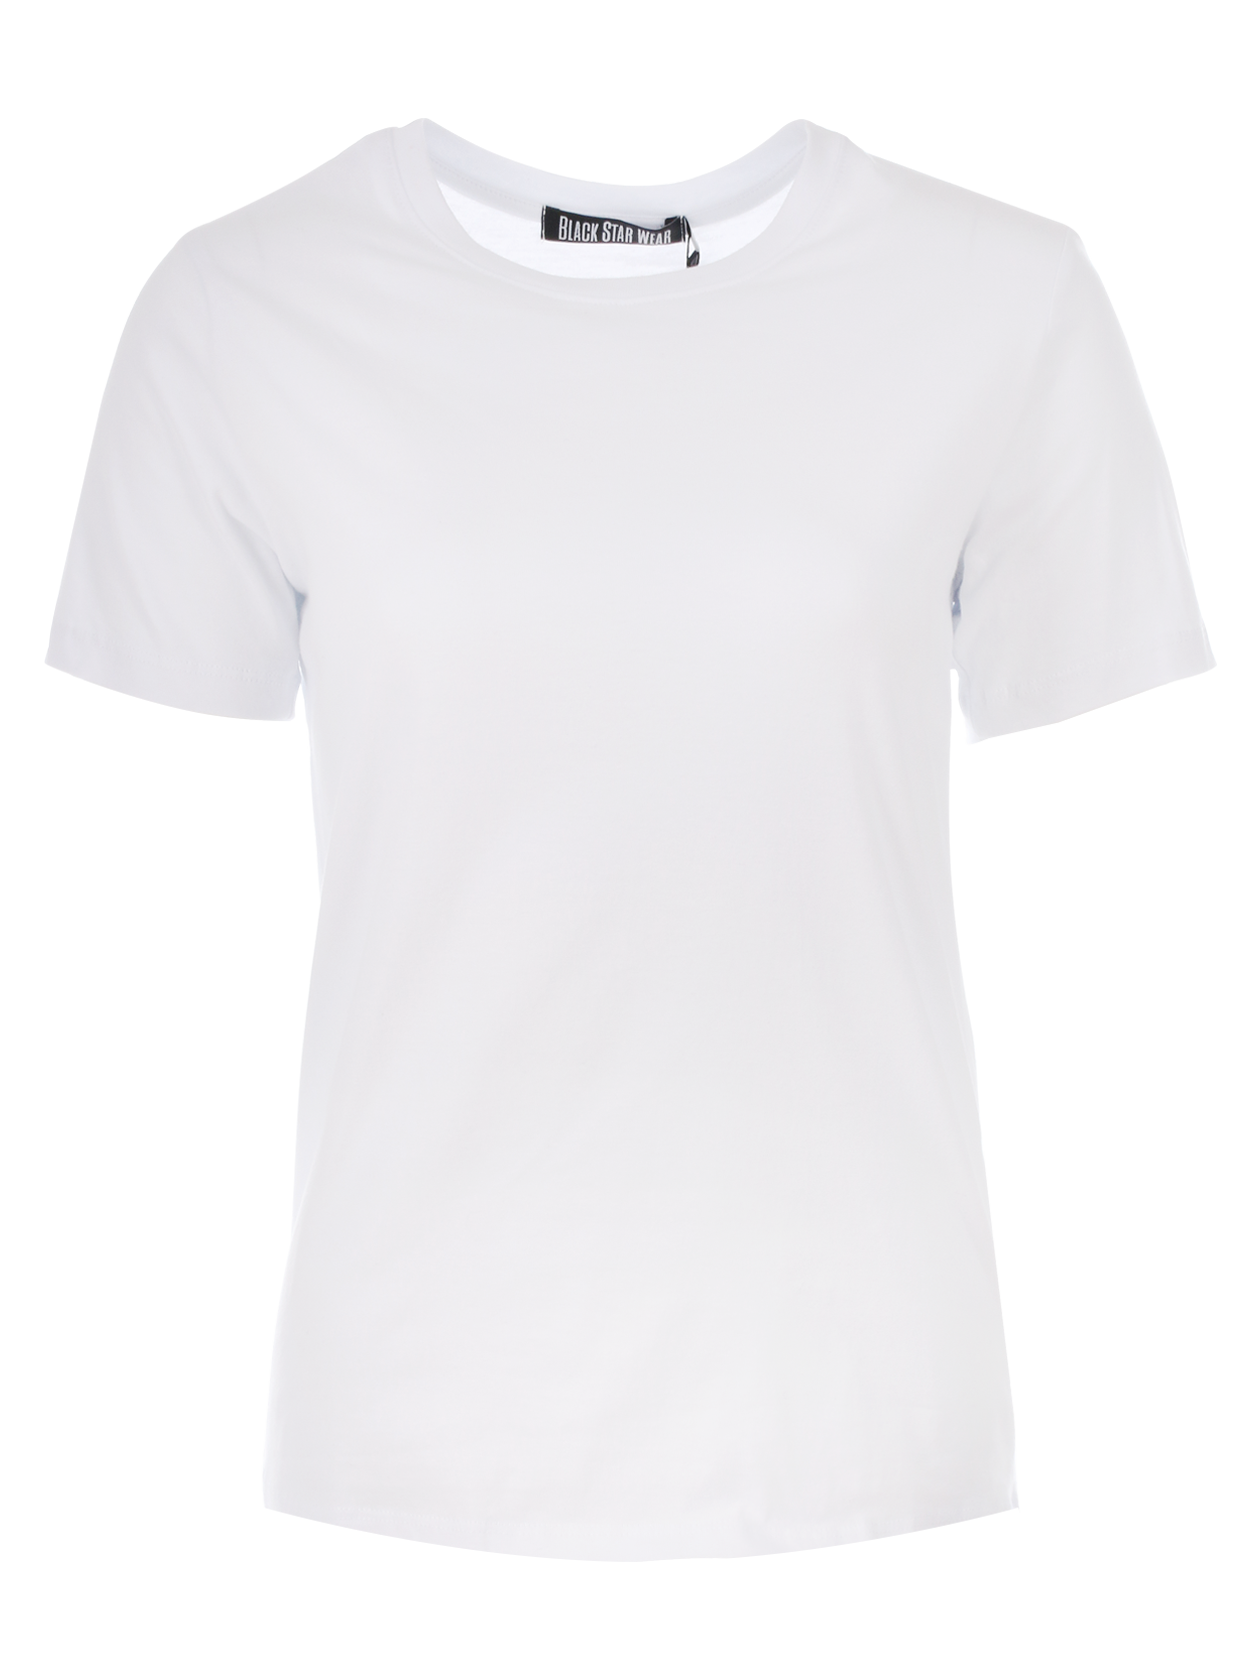 Womens t-shirt 13 от BlackStarWear INT